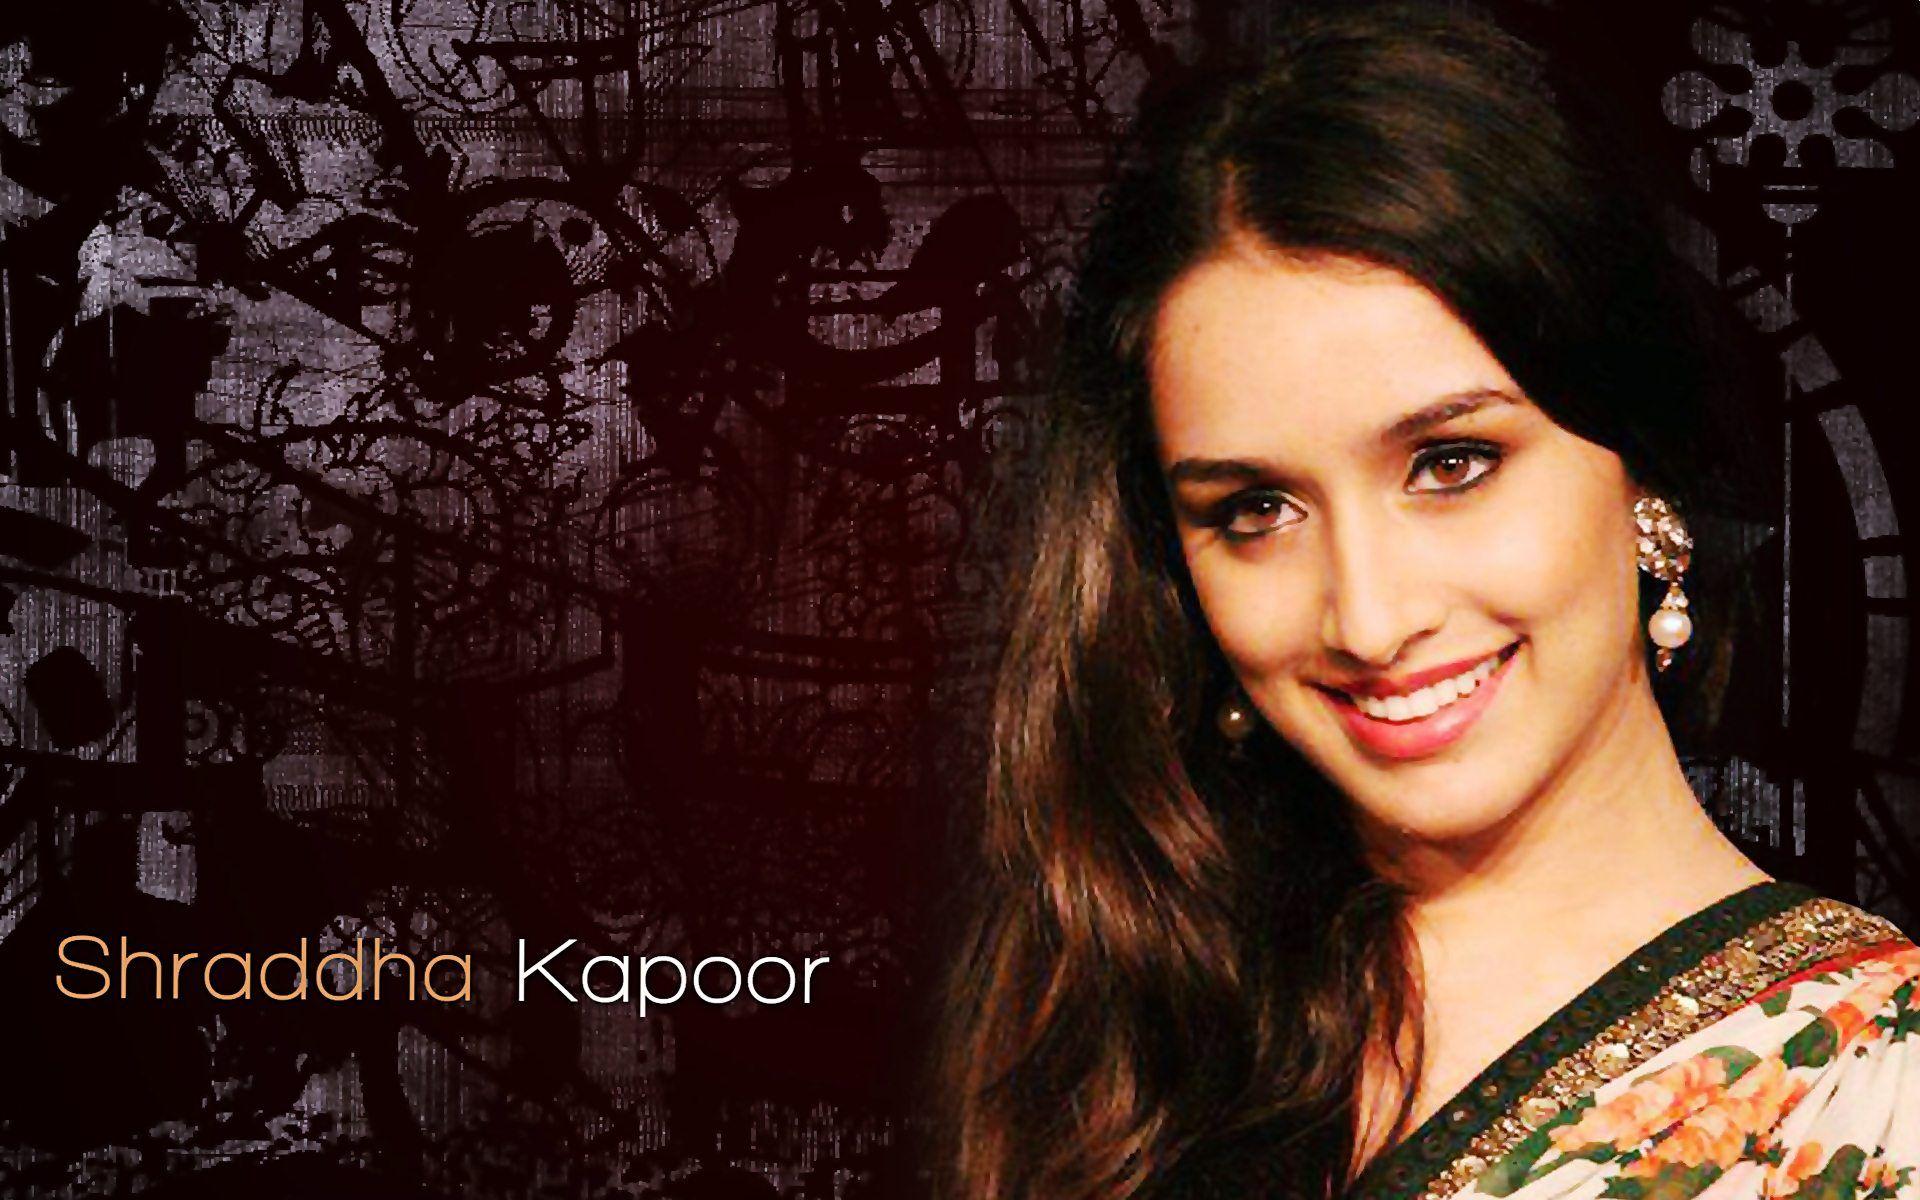 Shraddha Kapoor Wallpapers Hq Download Free Shraddha Kapoor In